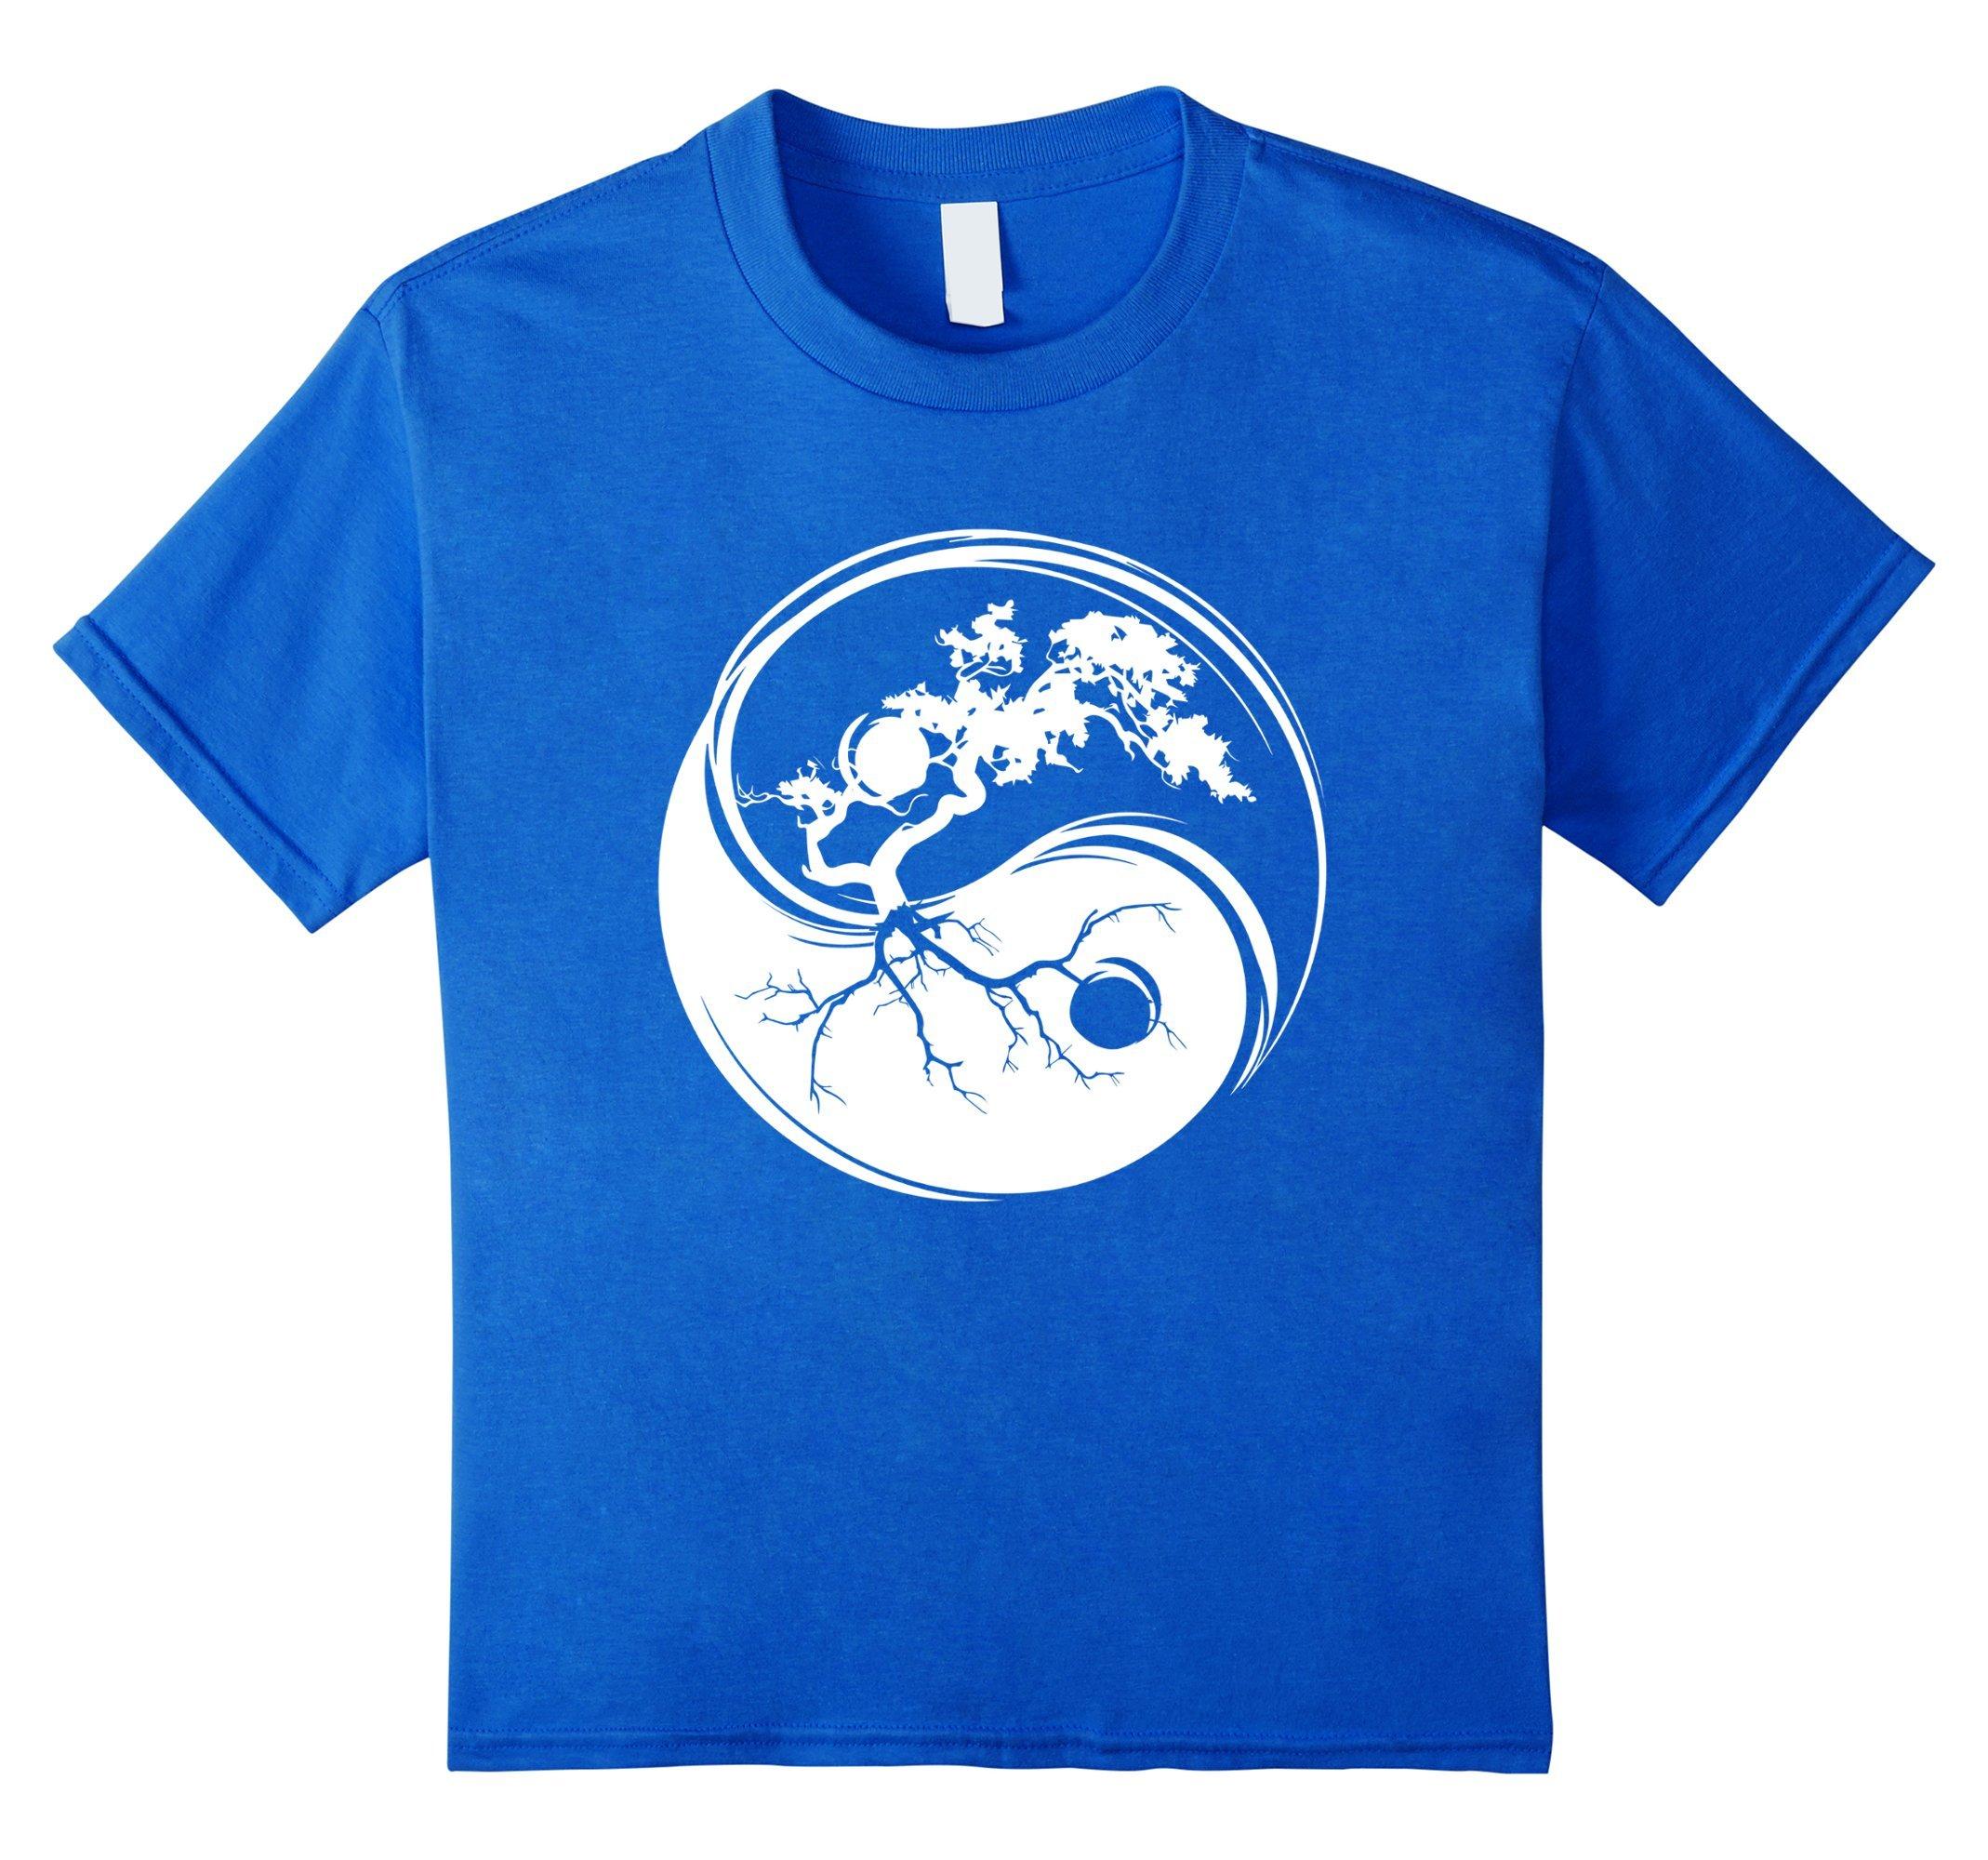 Kids Ying Yang Bonsai Tree Philosophy Shirt - Light & Dark Zen 8 Royal Blue